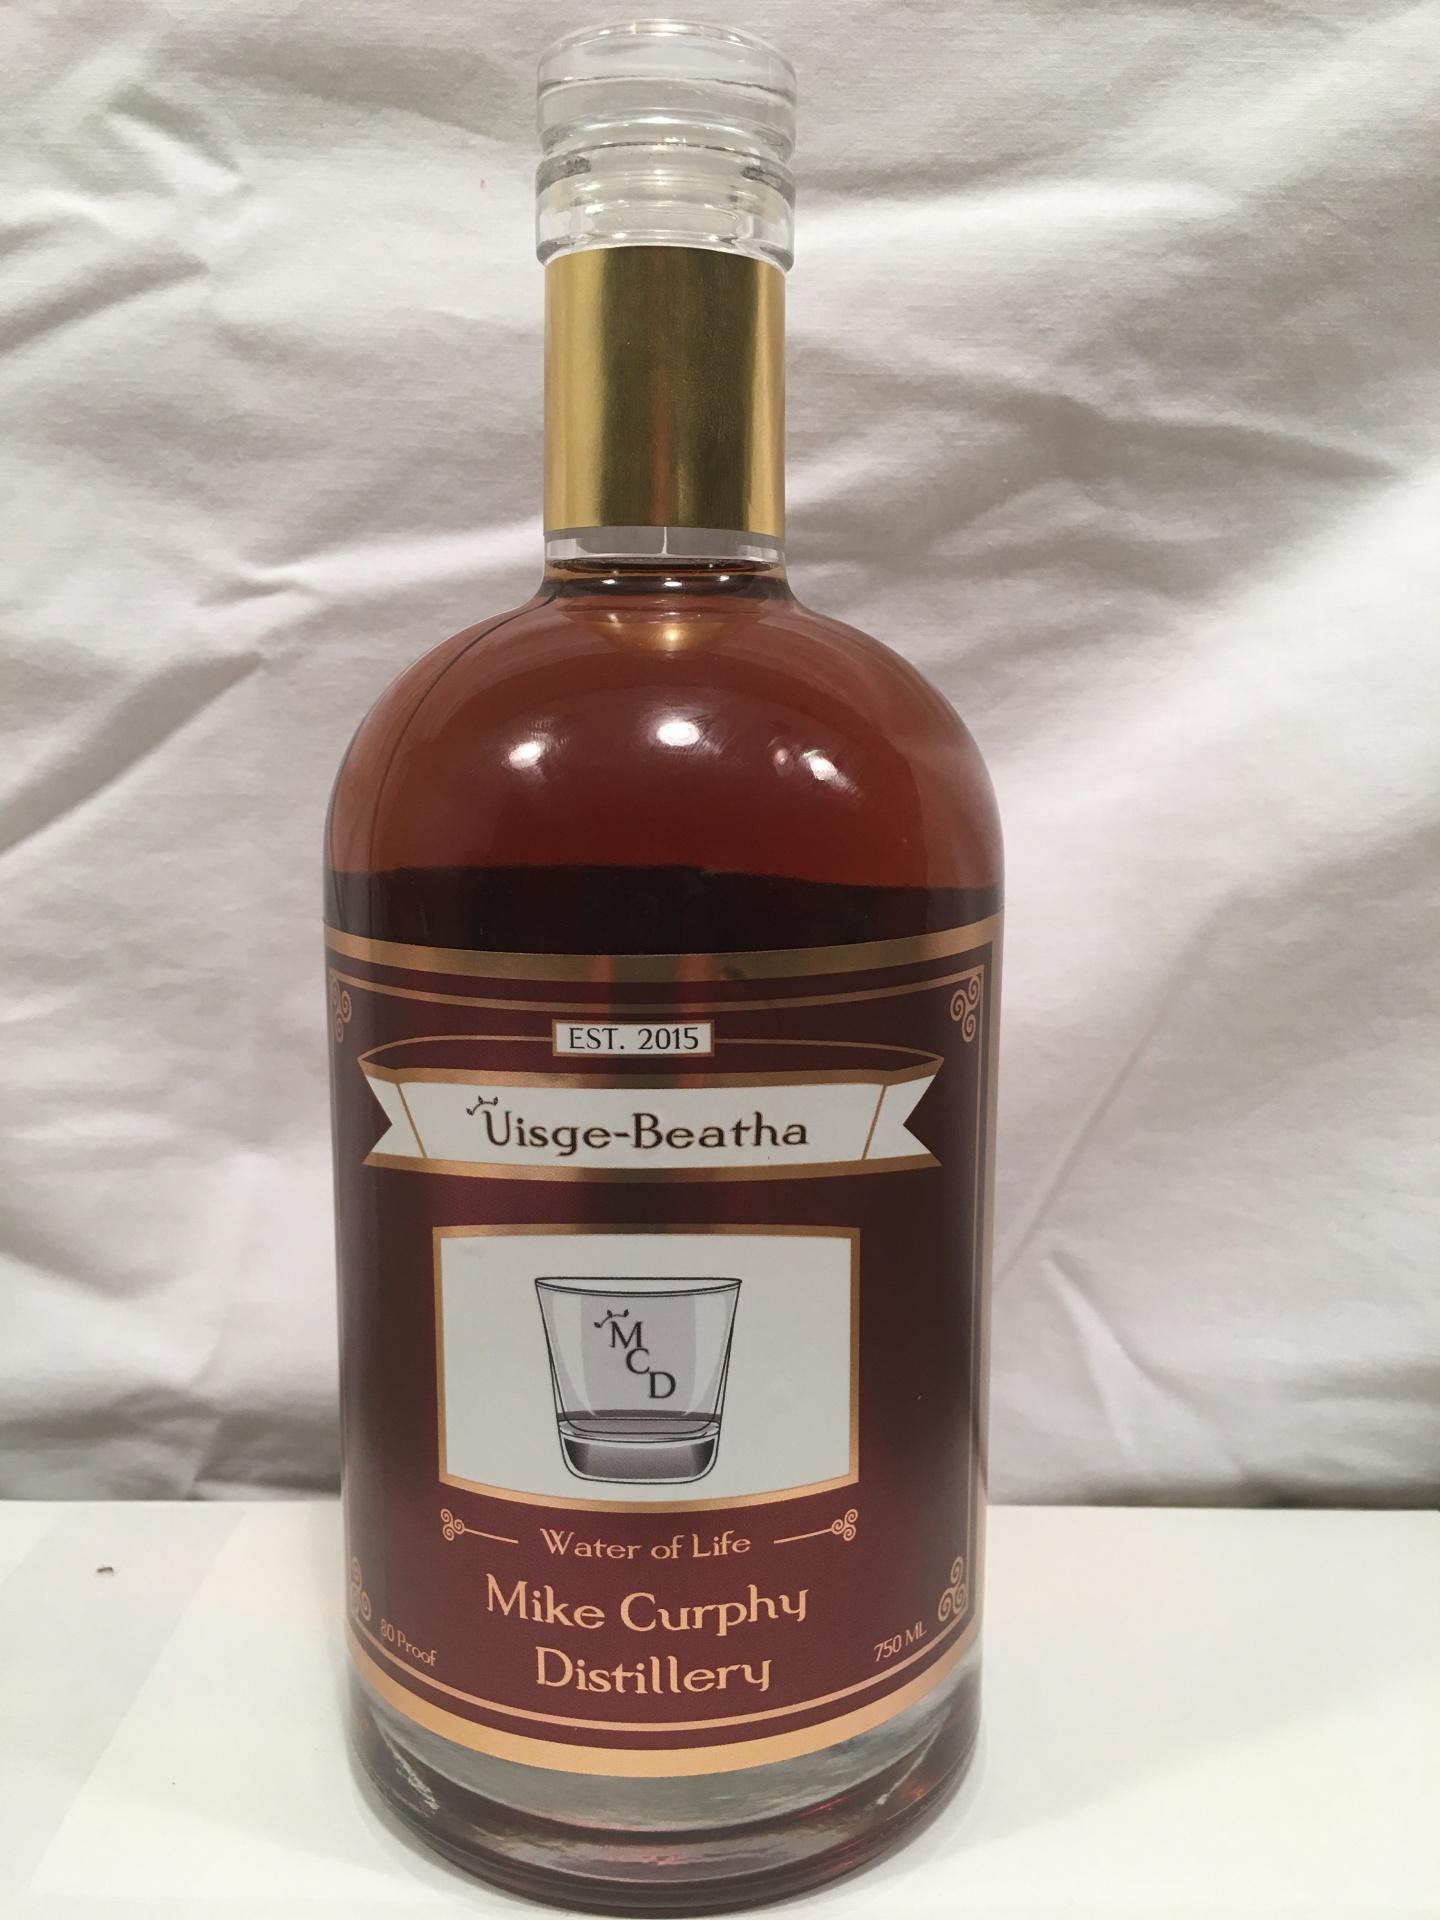 Uisge-Beatha (Unaged Scotch)